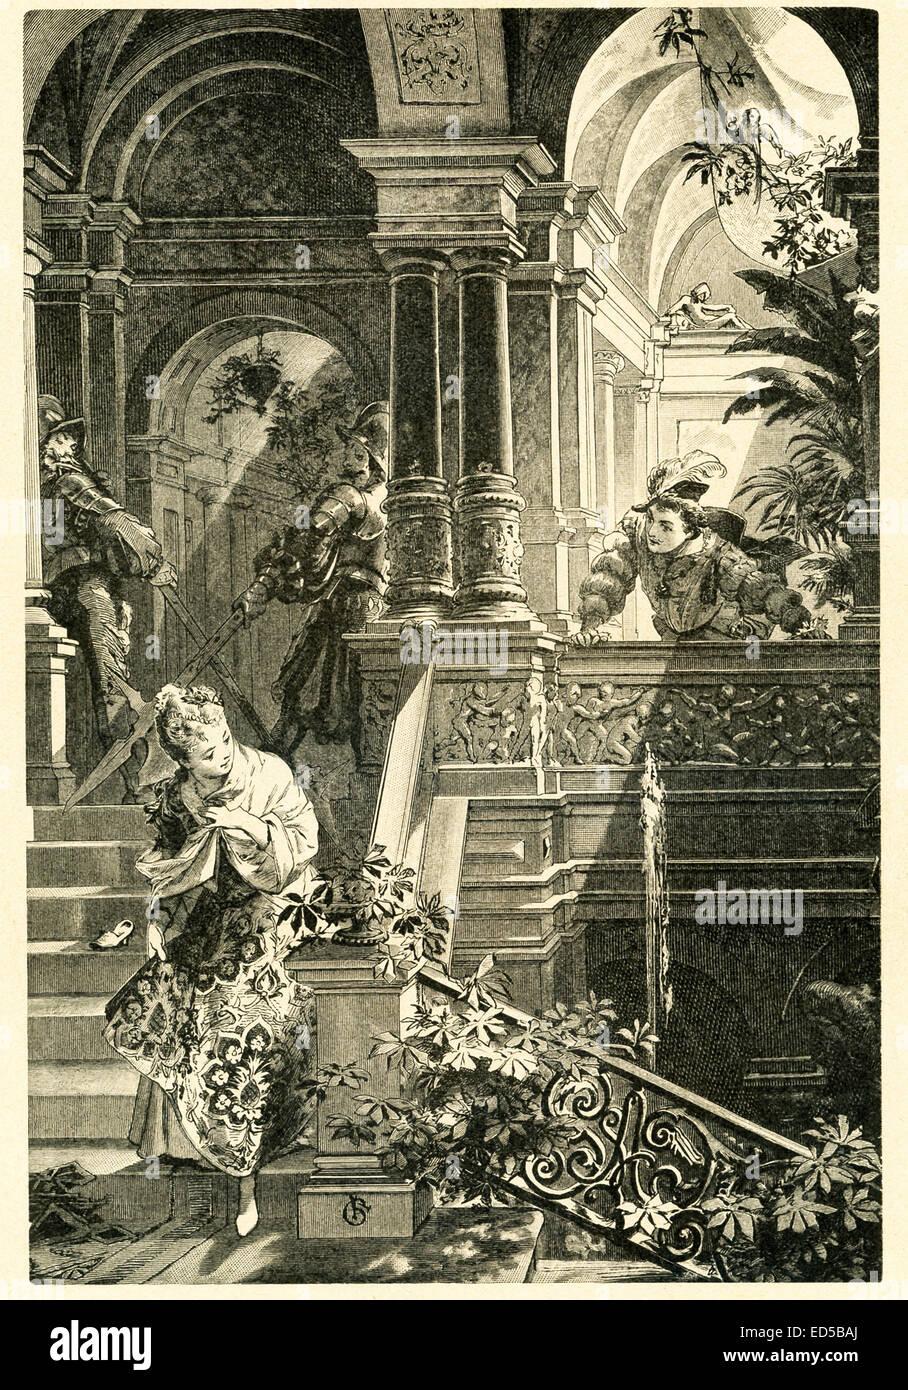 jacob and wilhelm grimm cinderella Cinderella grimm, jacob and wilhelm 1909-14 household tales the harvard classics fiction harvard classics jacob and wilhelm grimm household tales previous.